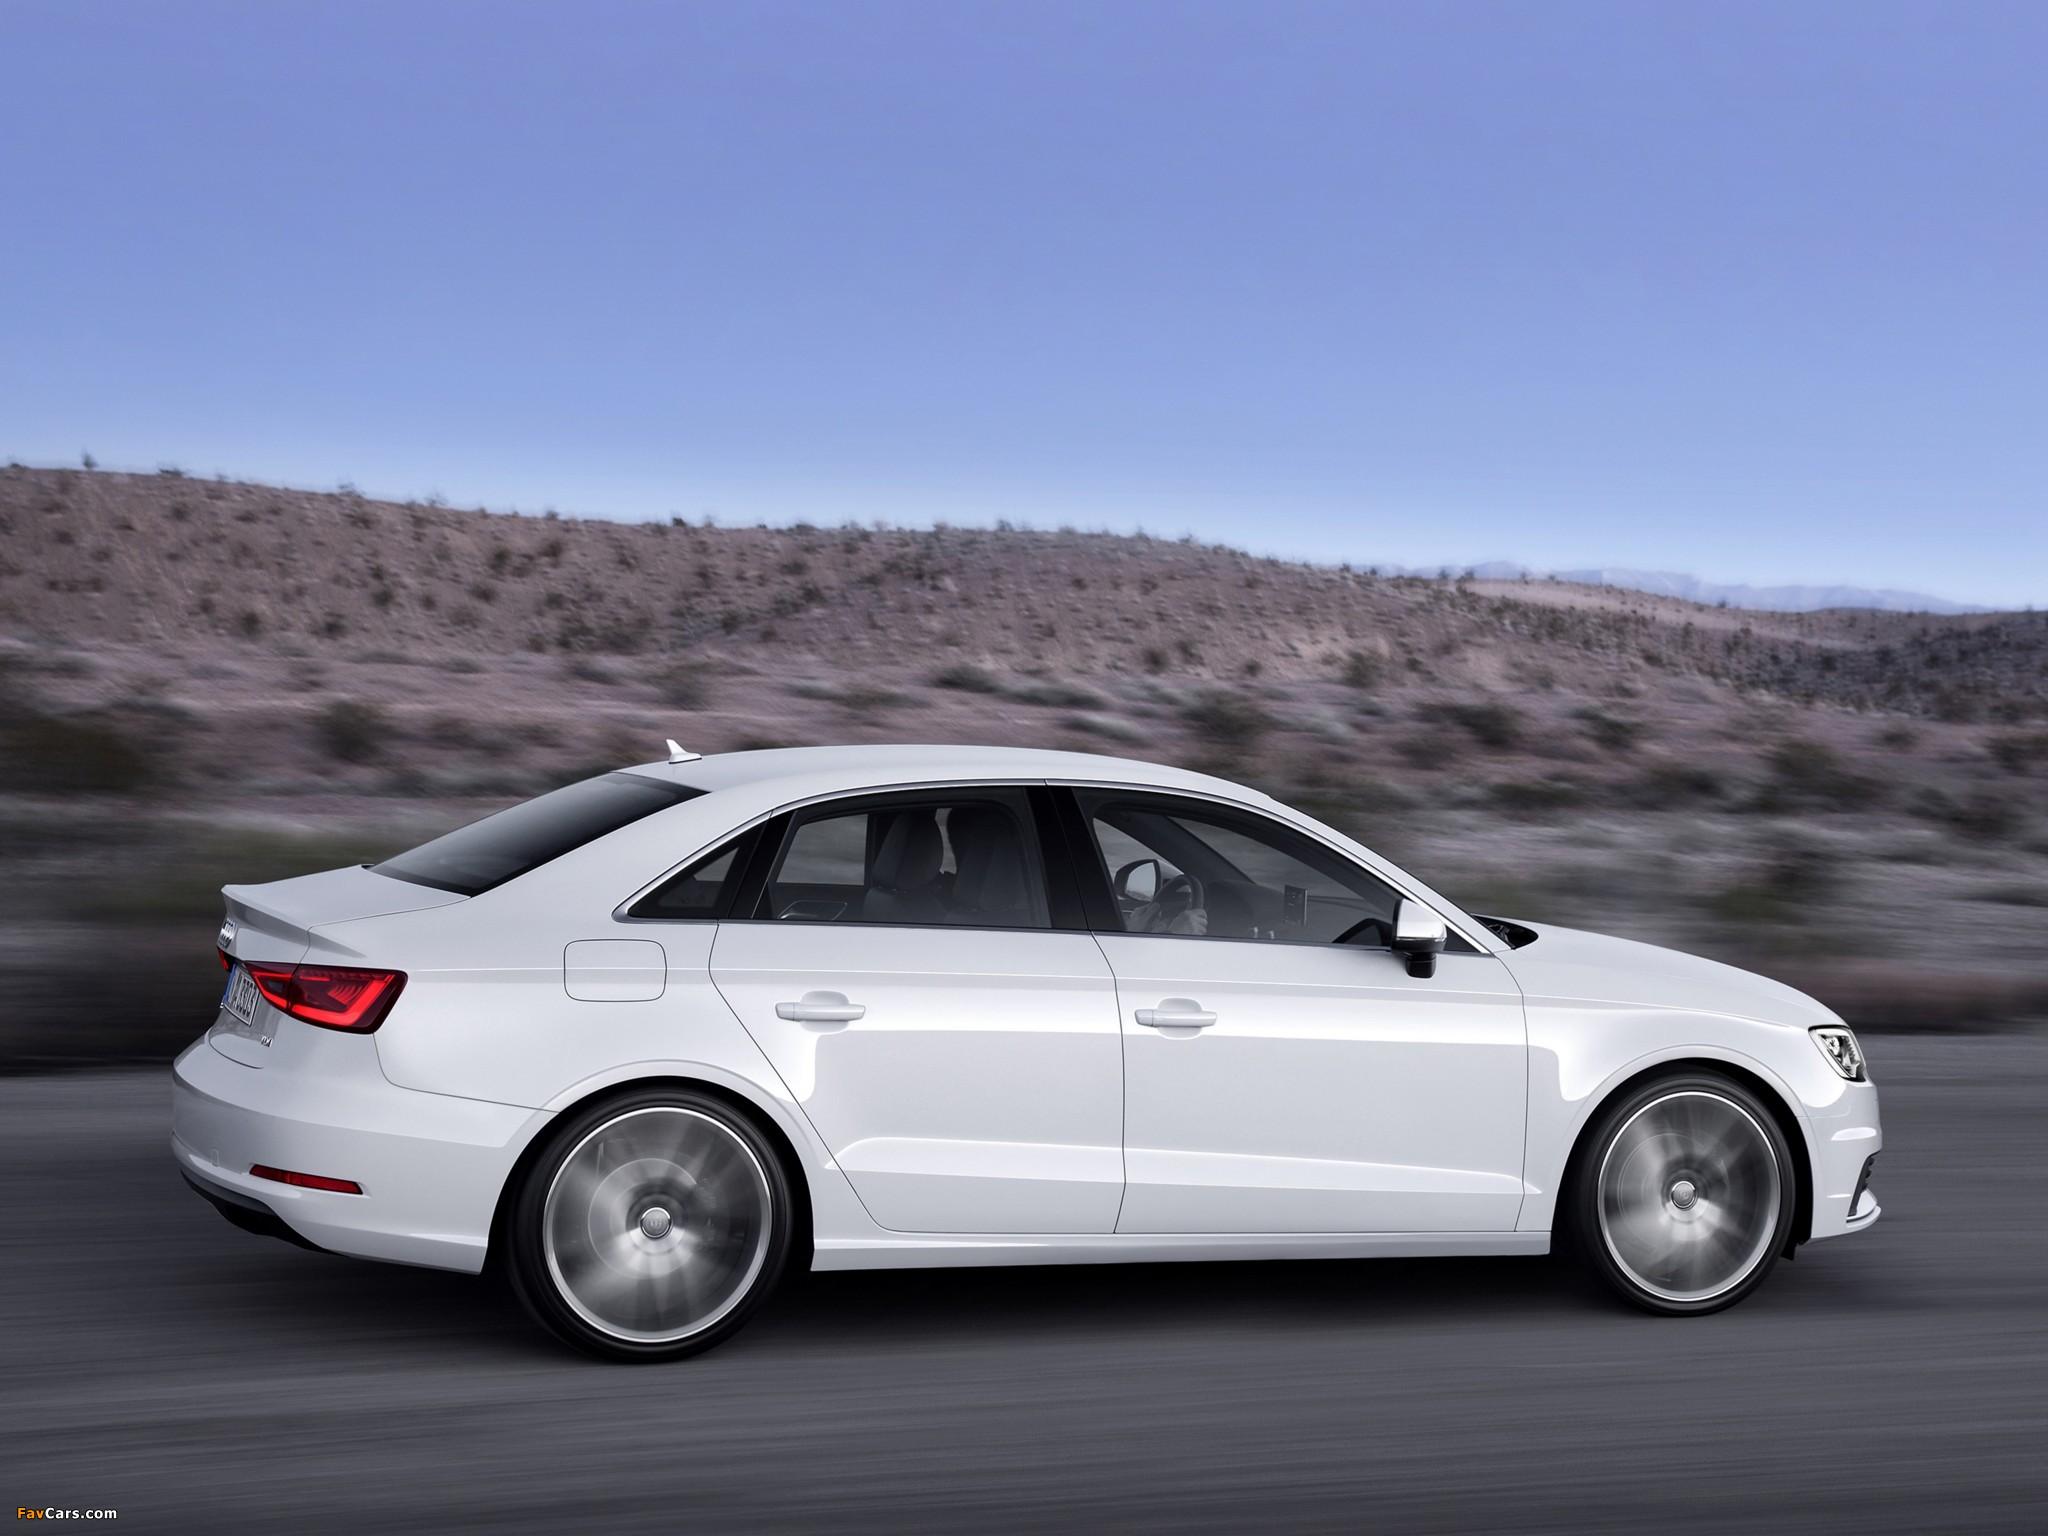 Audi A3 Sedan 2 0 Tdi 8v 2013 Pictures 2048x1536